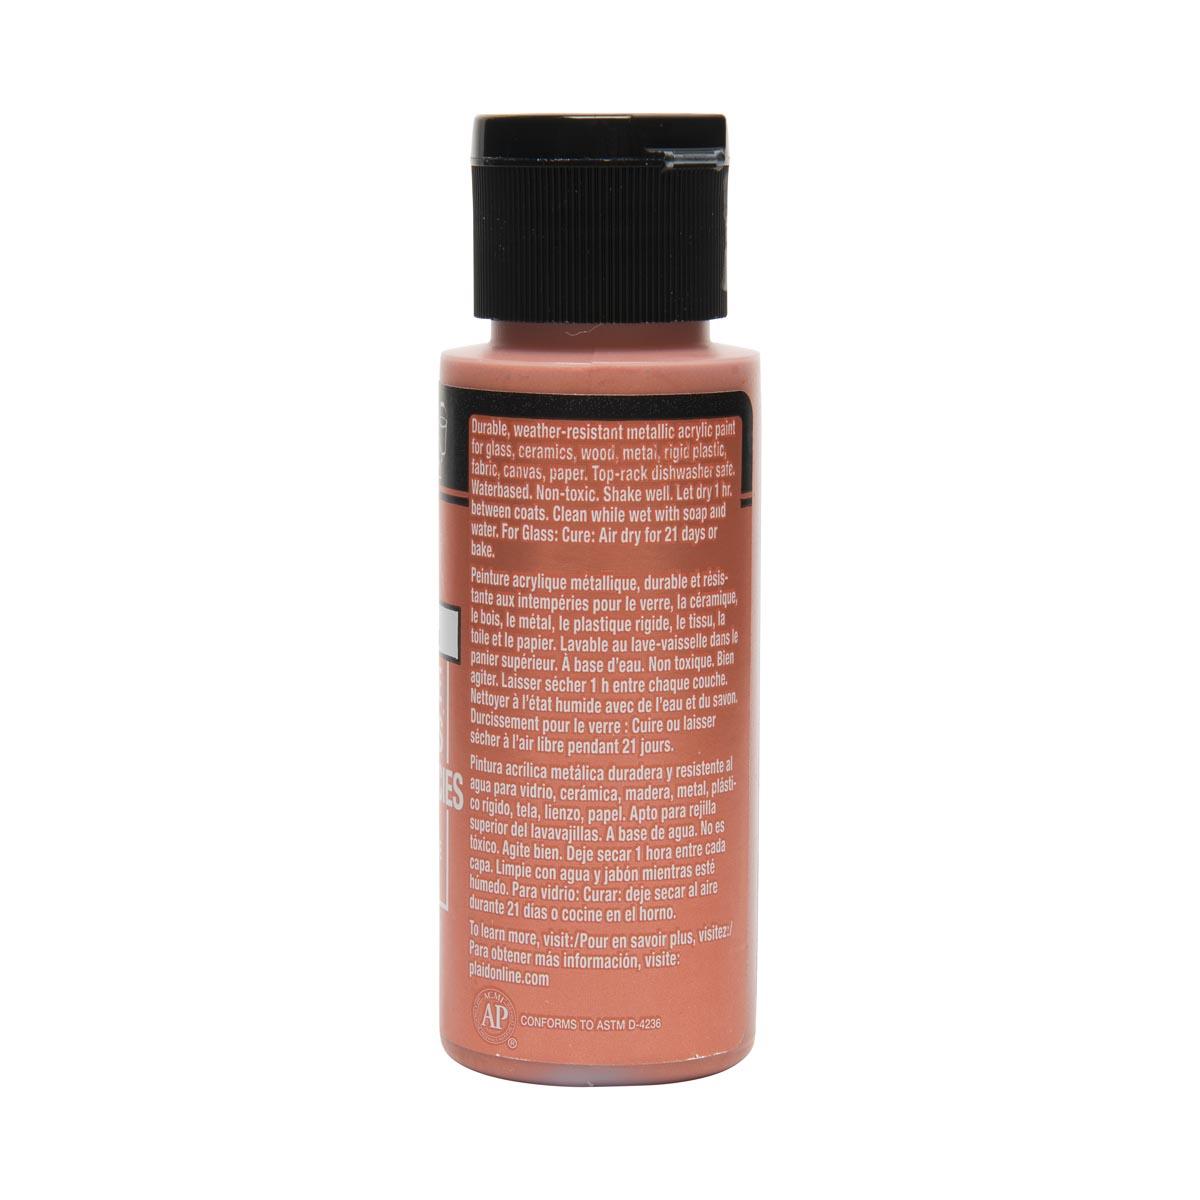 FolkArt ® Multi-Surface Metallic Acrylic Paints - Fire Opal, 2 oz.